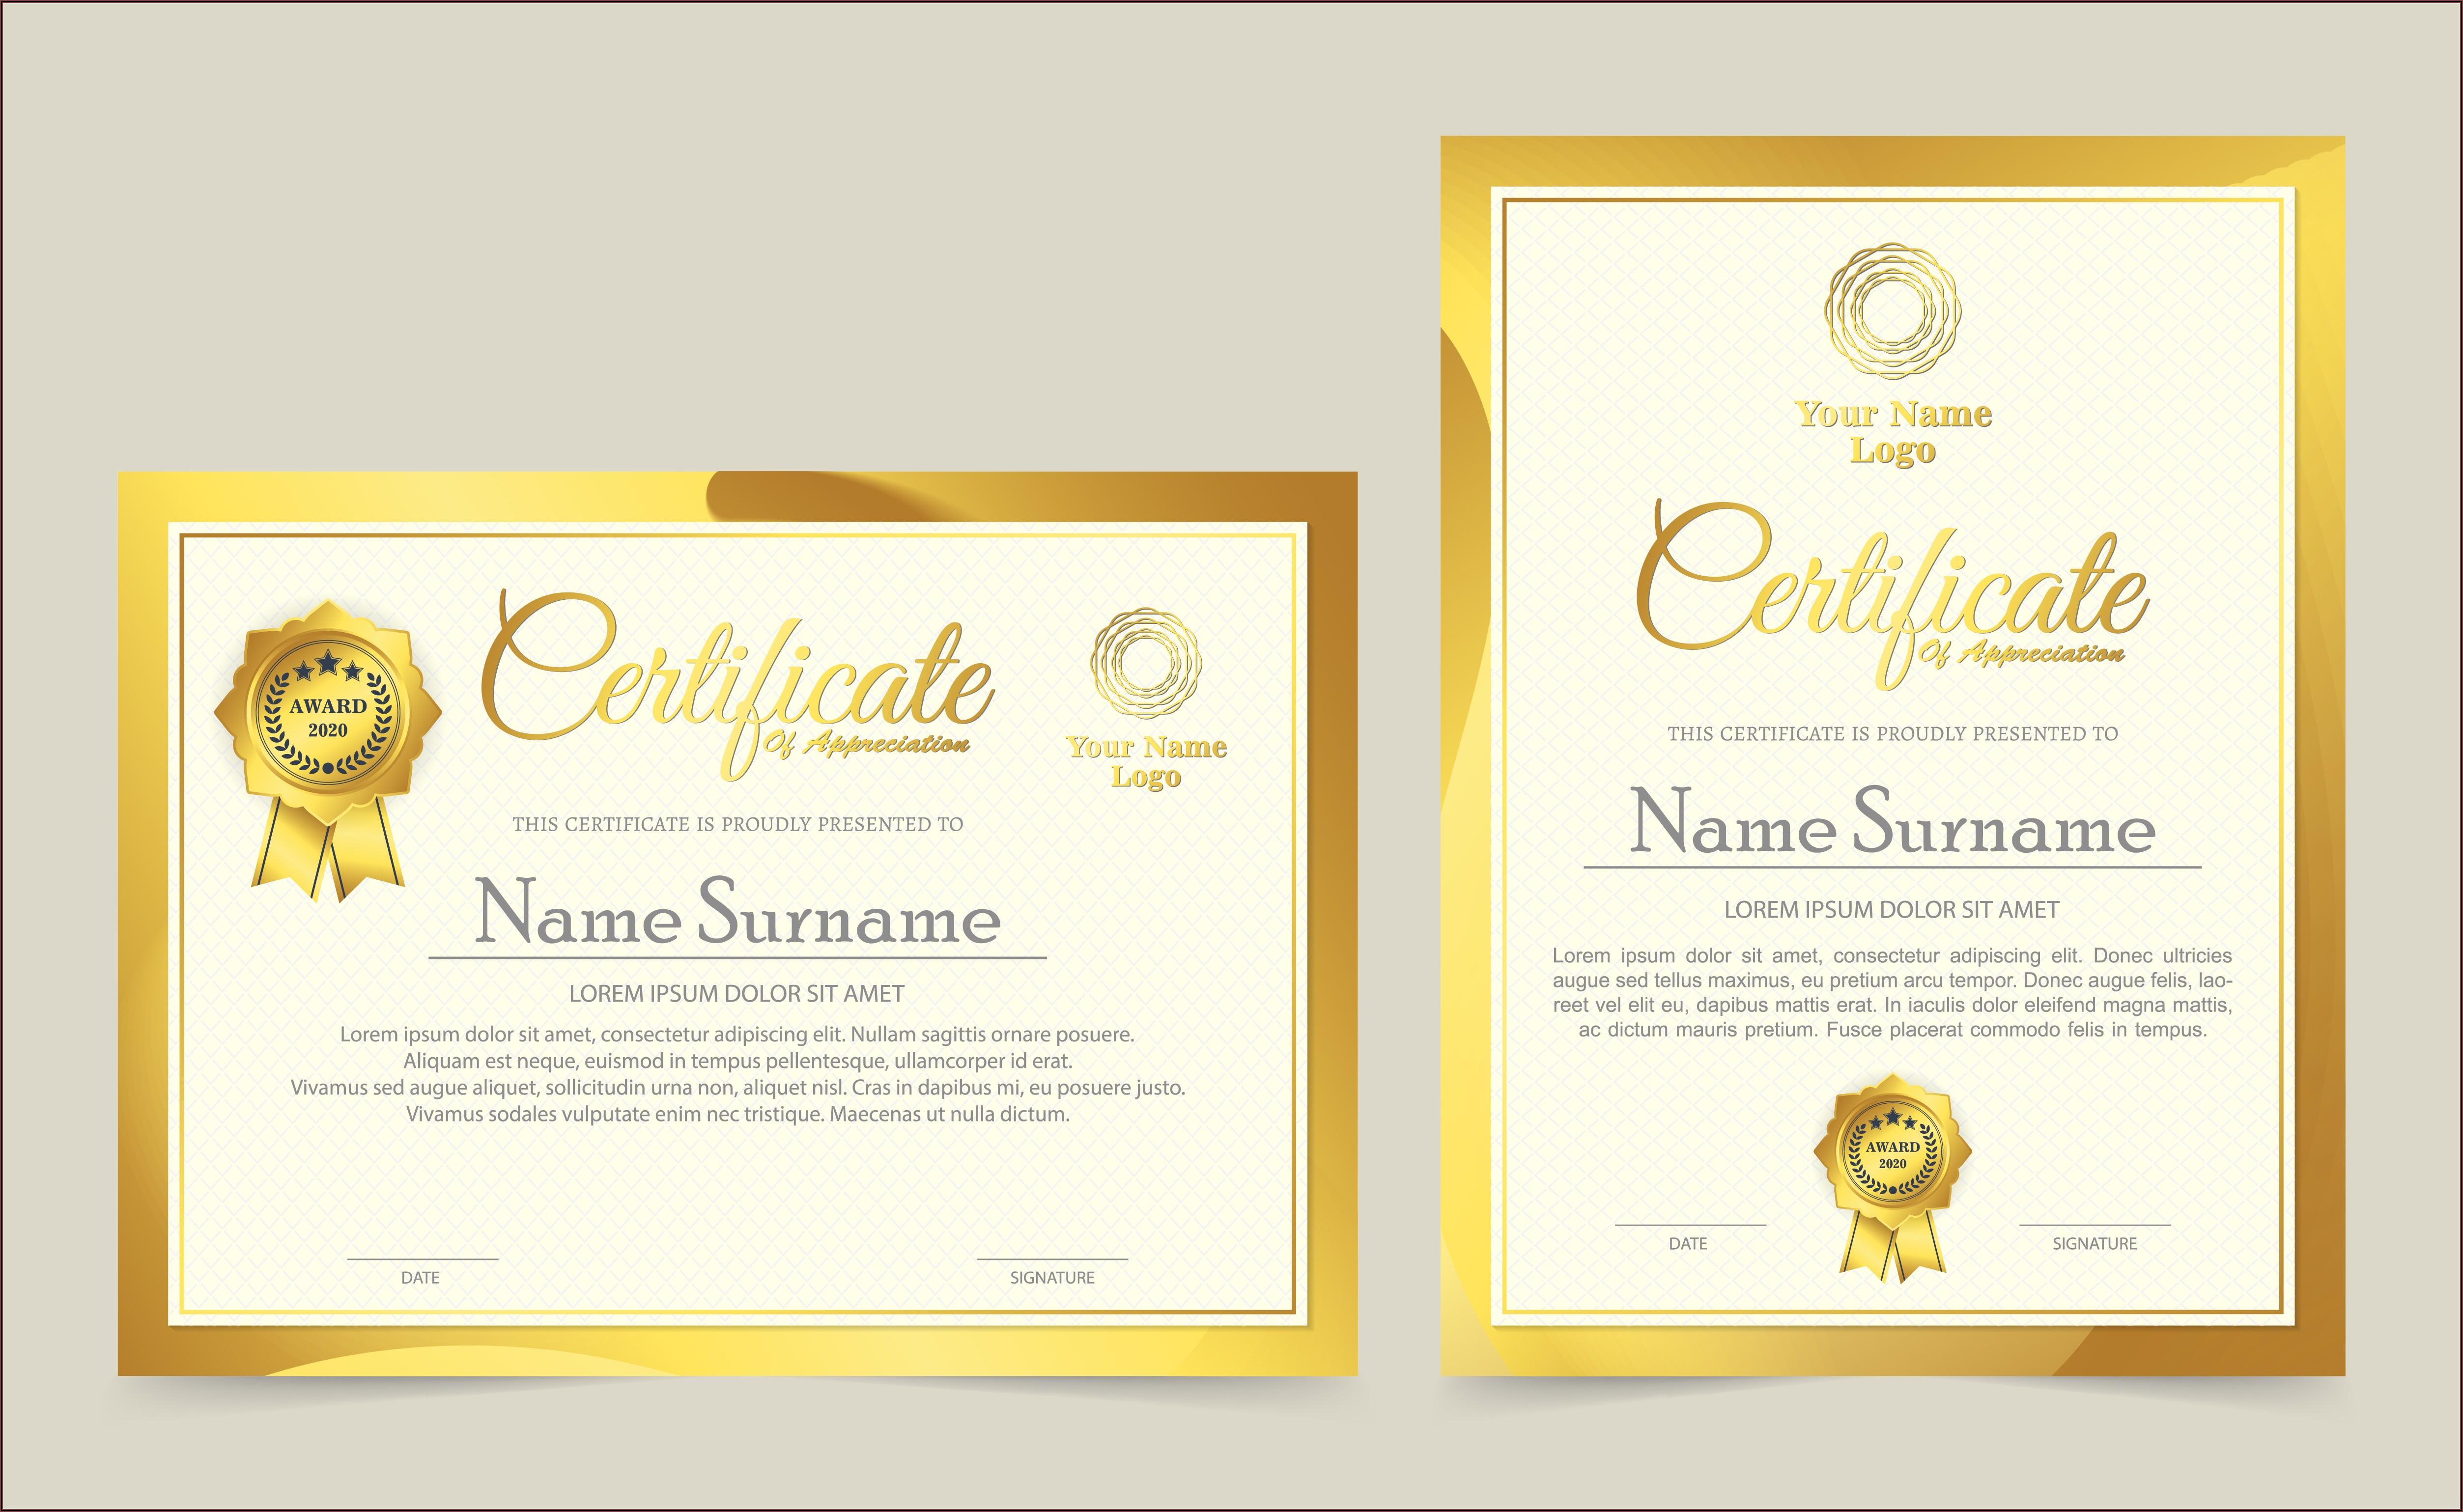 Professional Award Certificate Templates Free